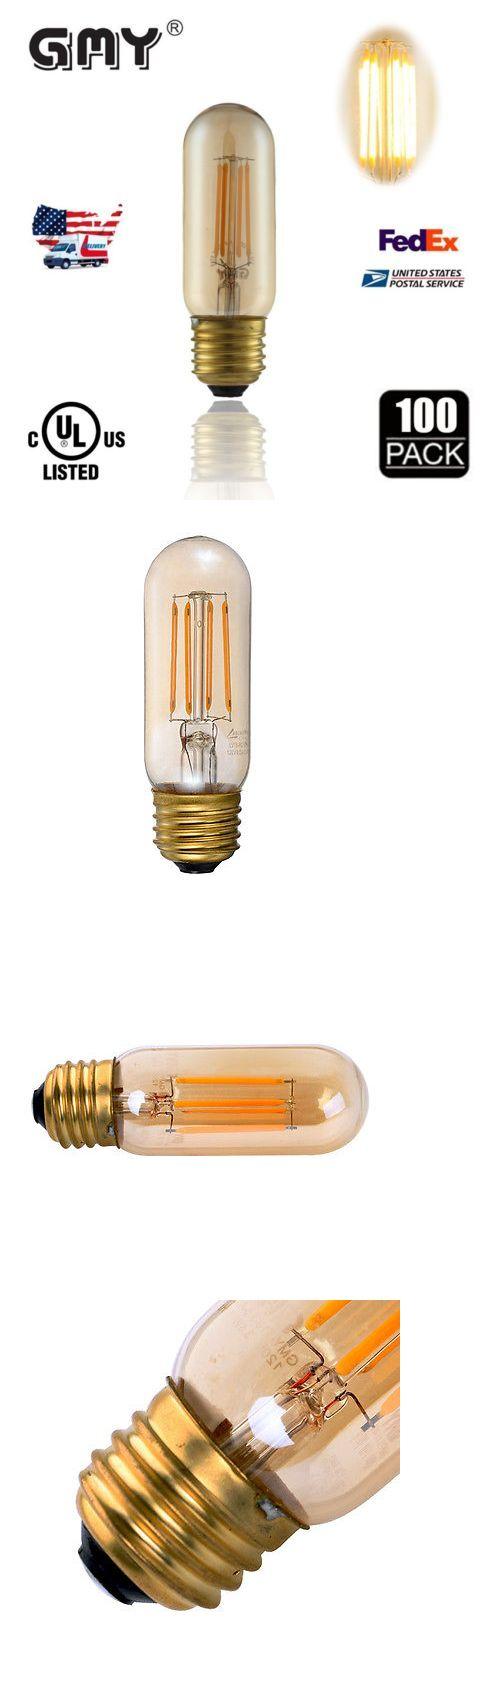 Teardrop st64 william and watson vintage edison bulb industrial light - Light Bulbs 20706 100 X Dimmable T10 3 5w E26 Tube Warm Led Filament Edison